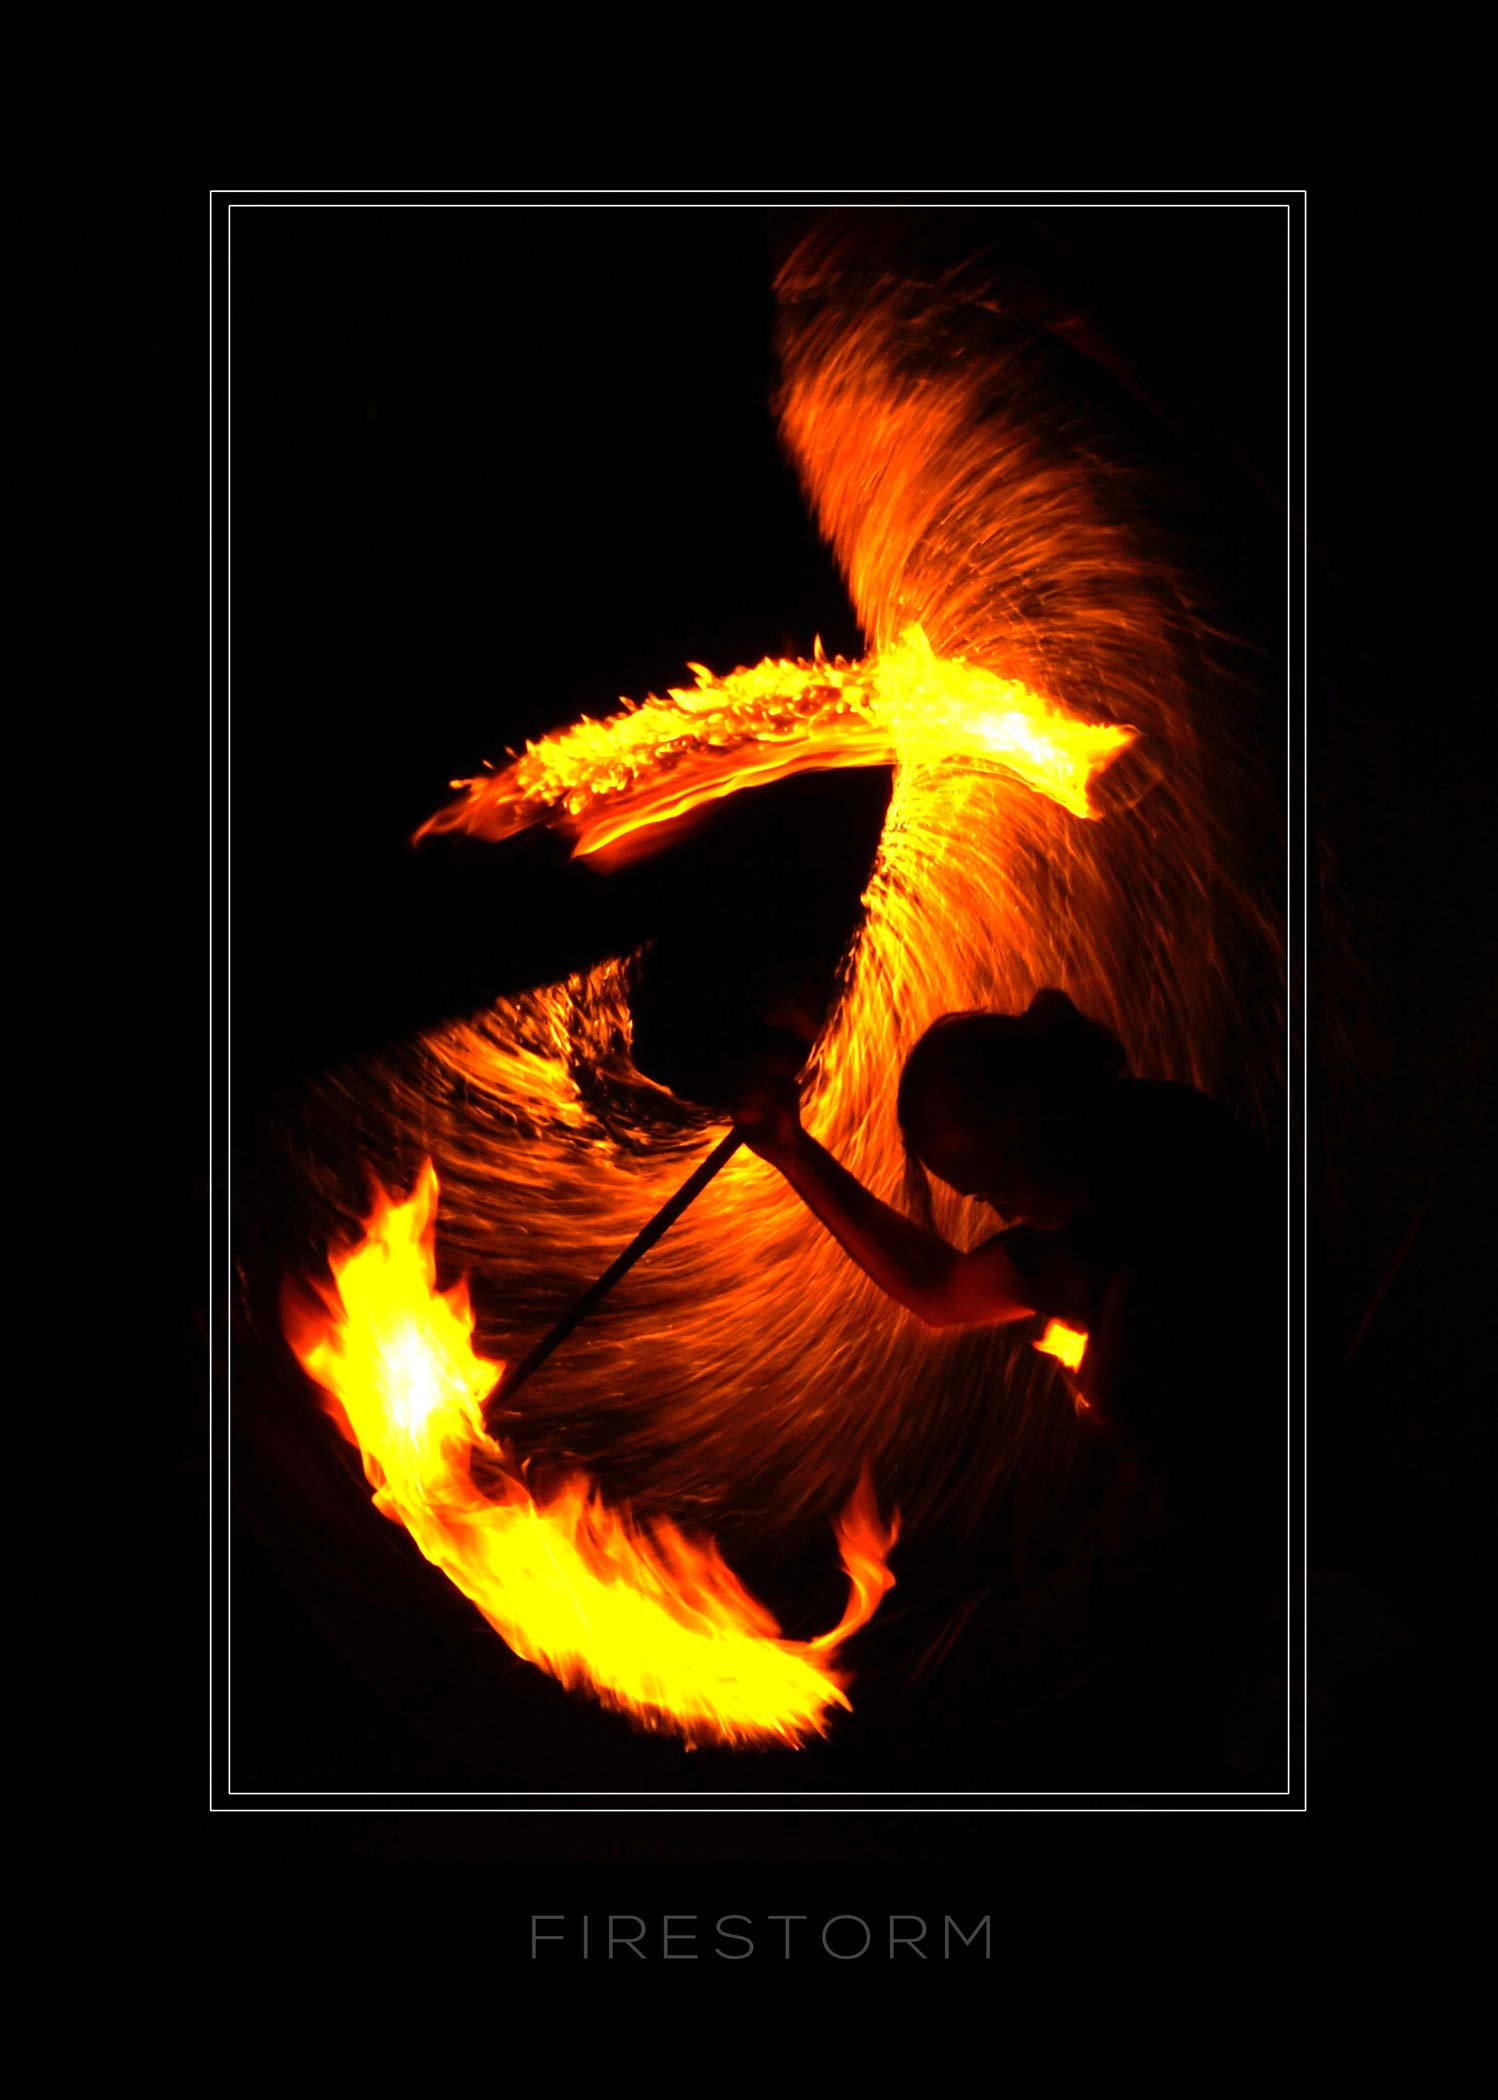 Firestorm_Print2